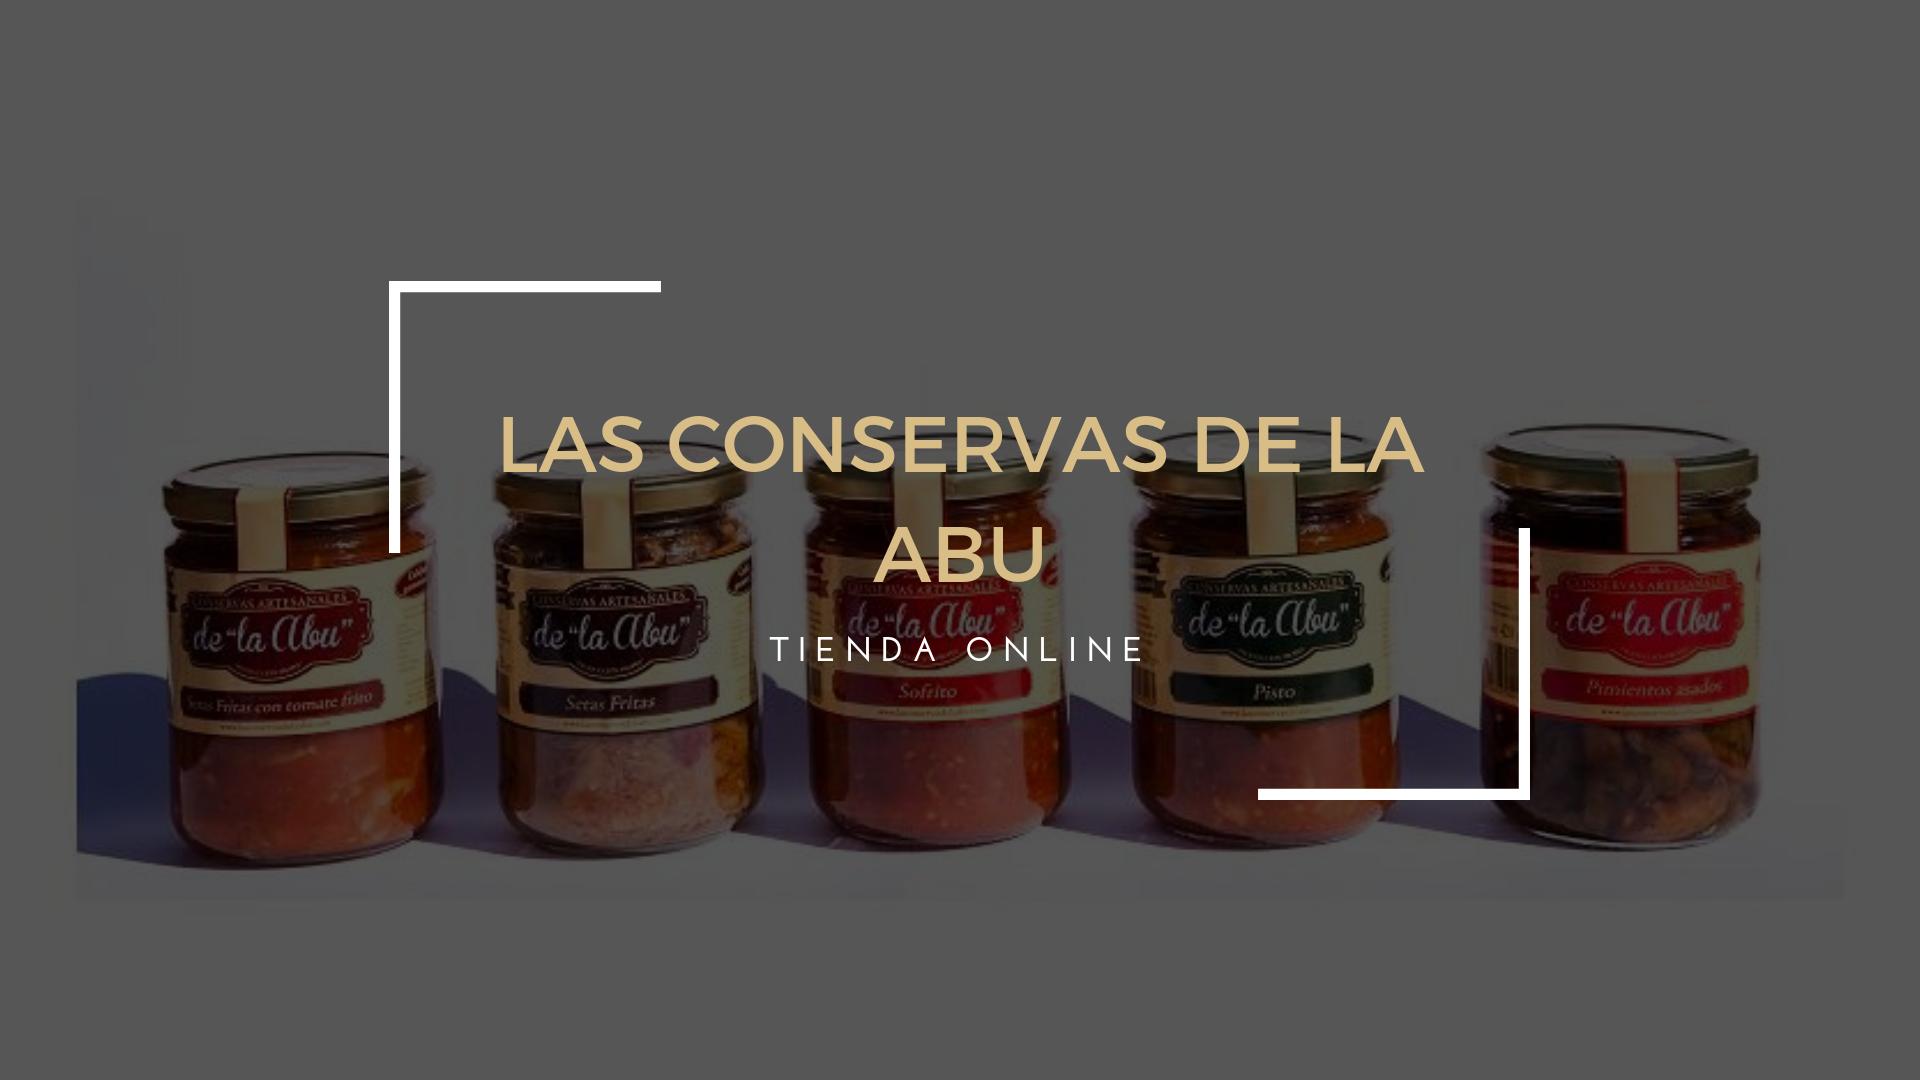 Comprar conservas artesanas: